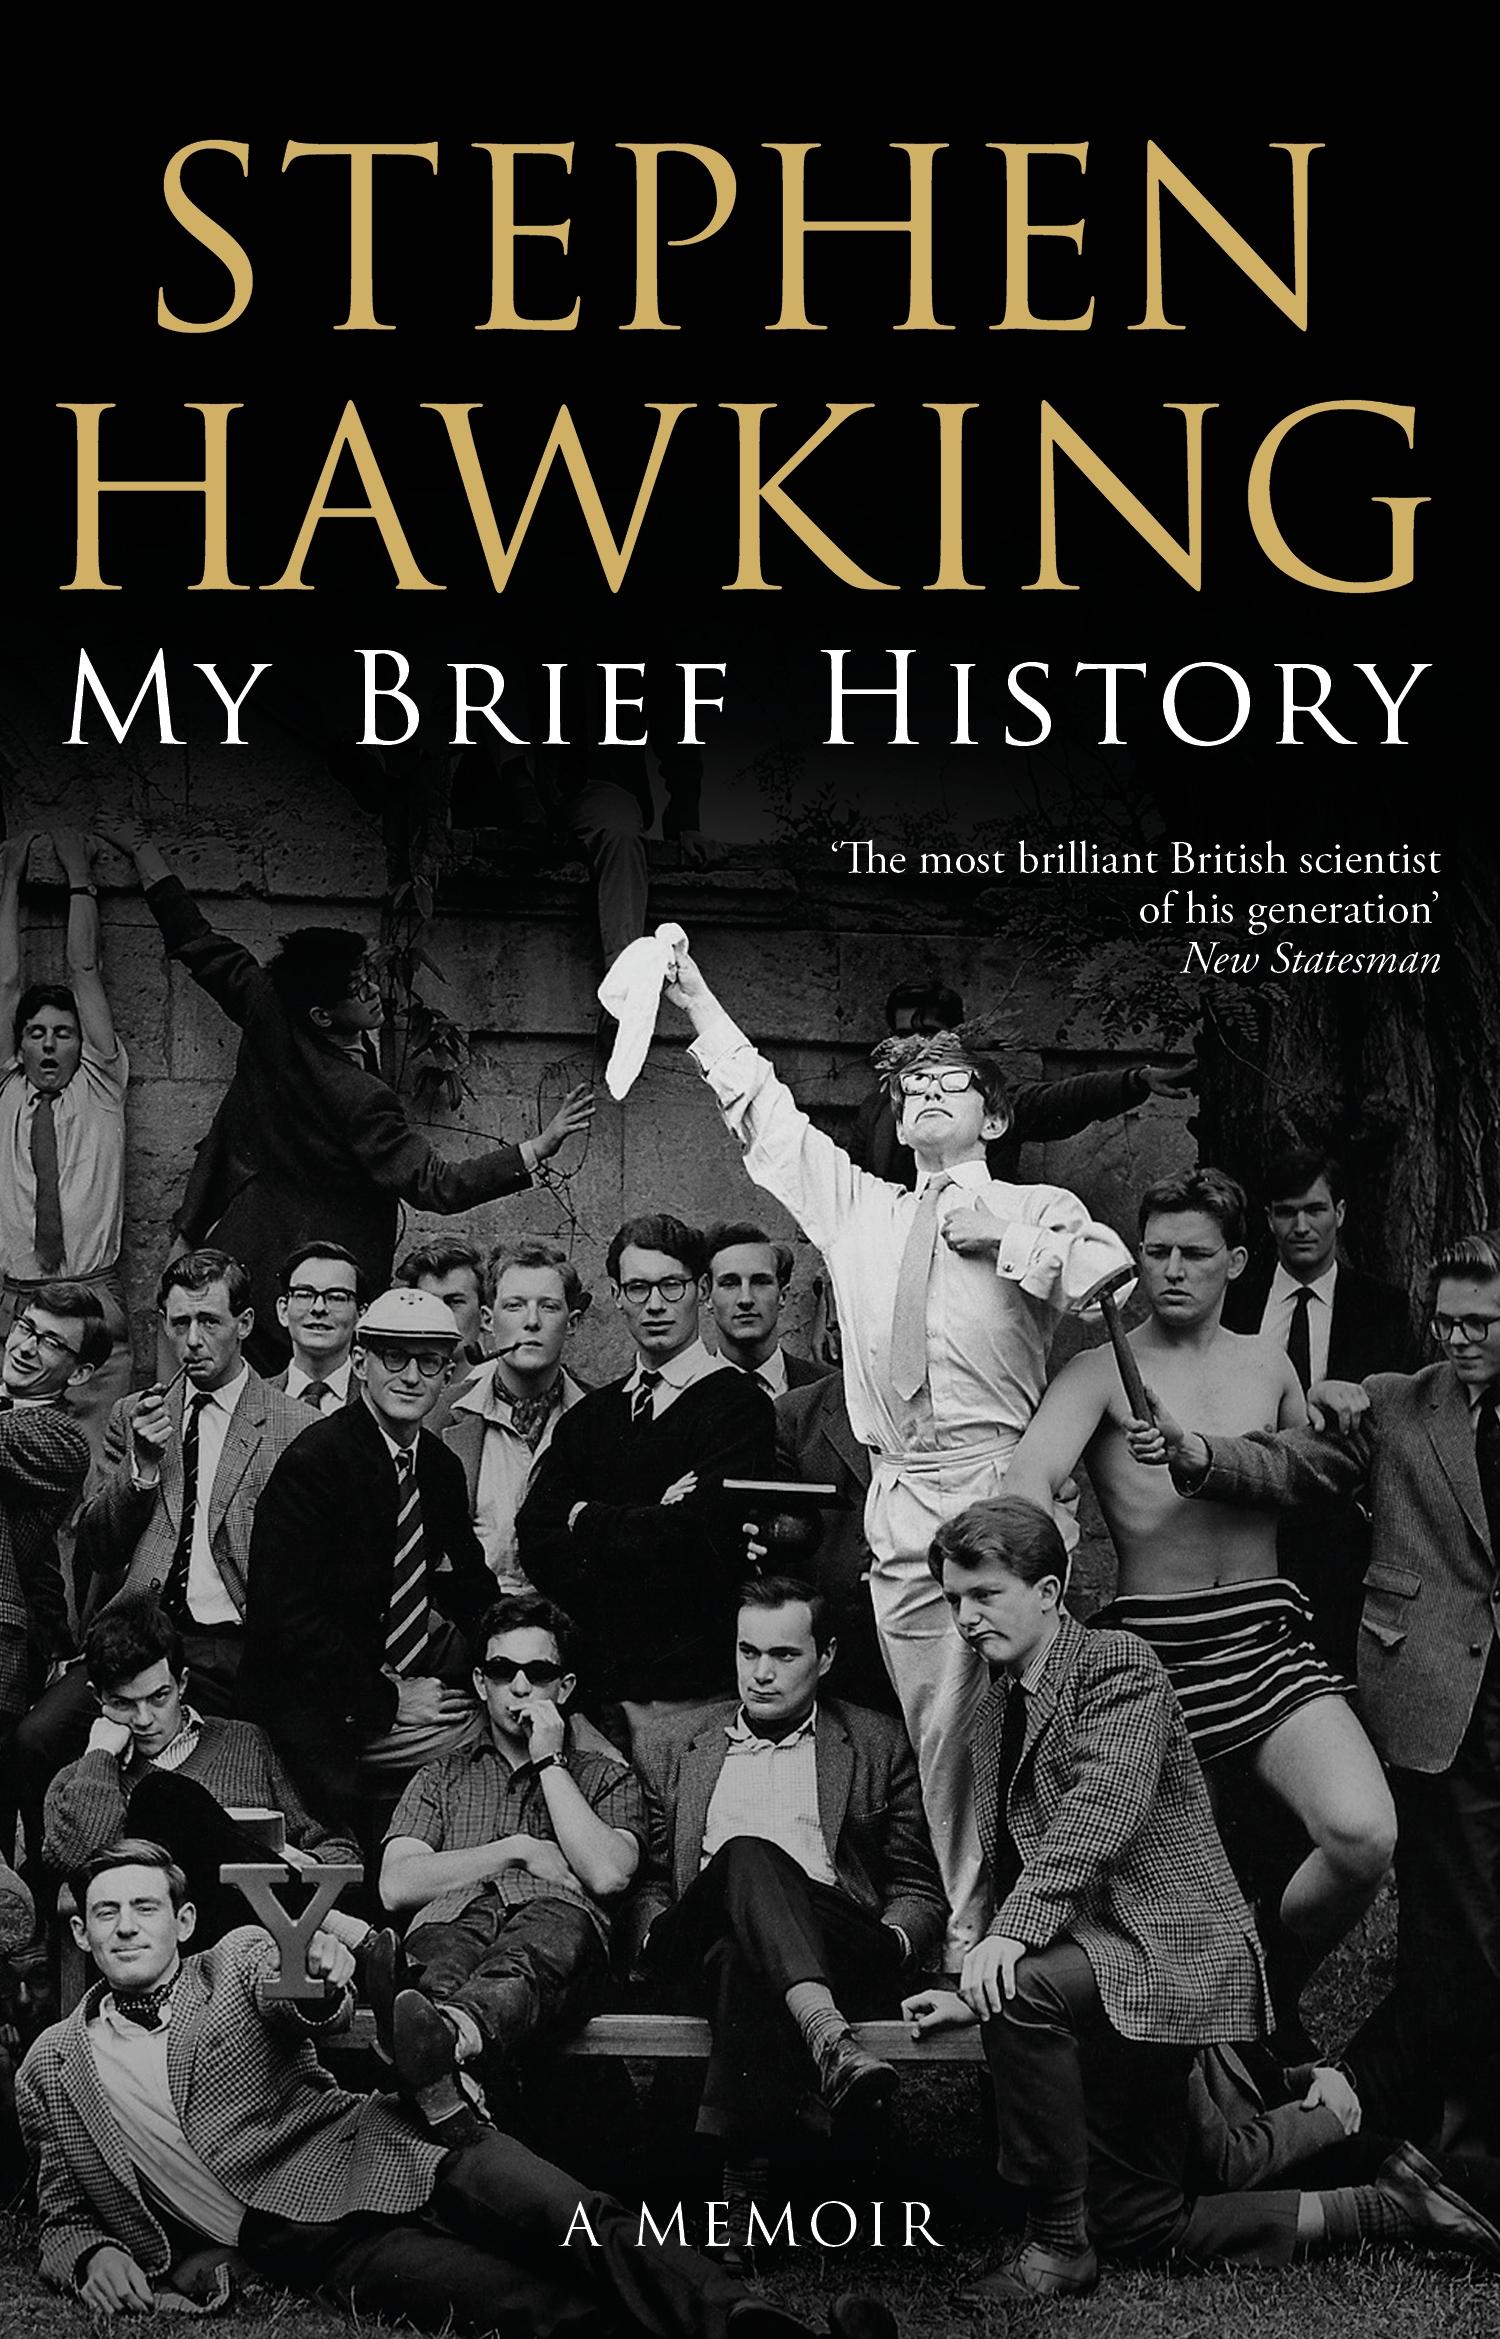 stephen hawking books pdf free download